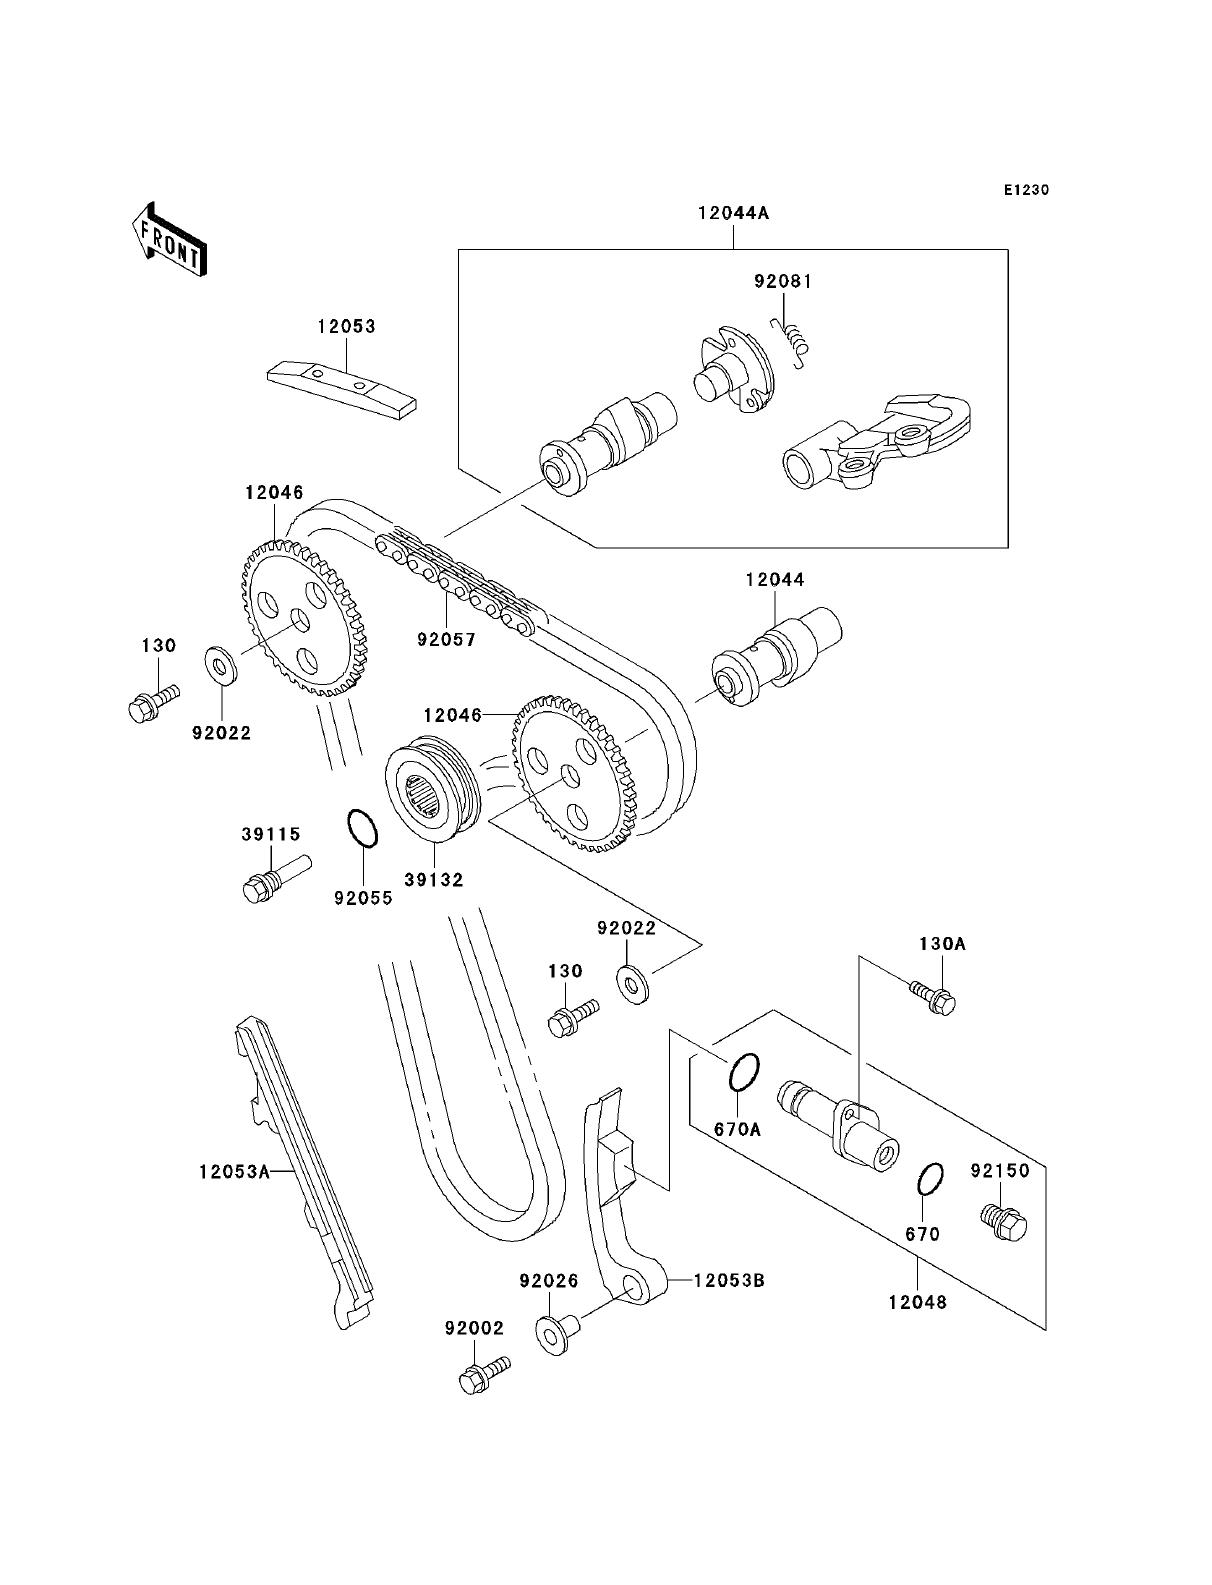 2001 klr 650 wiring diagram visio logical network yamaha ttr 225 auto